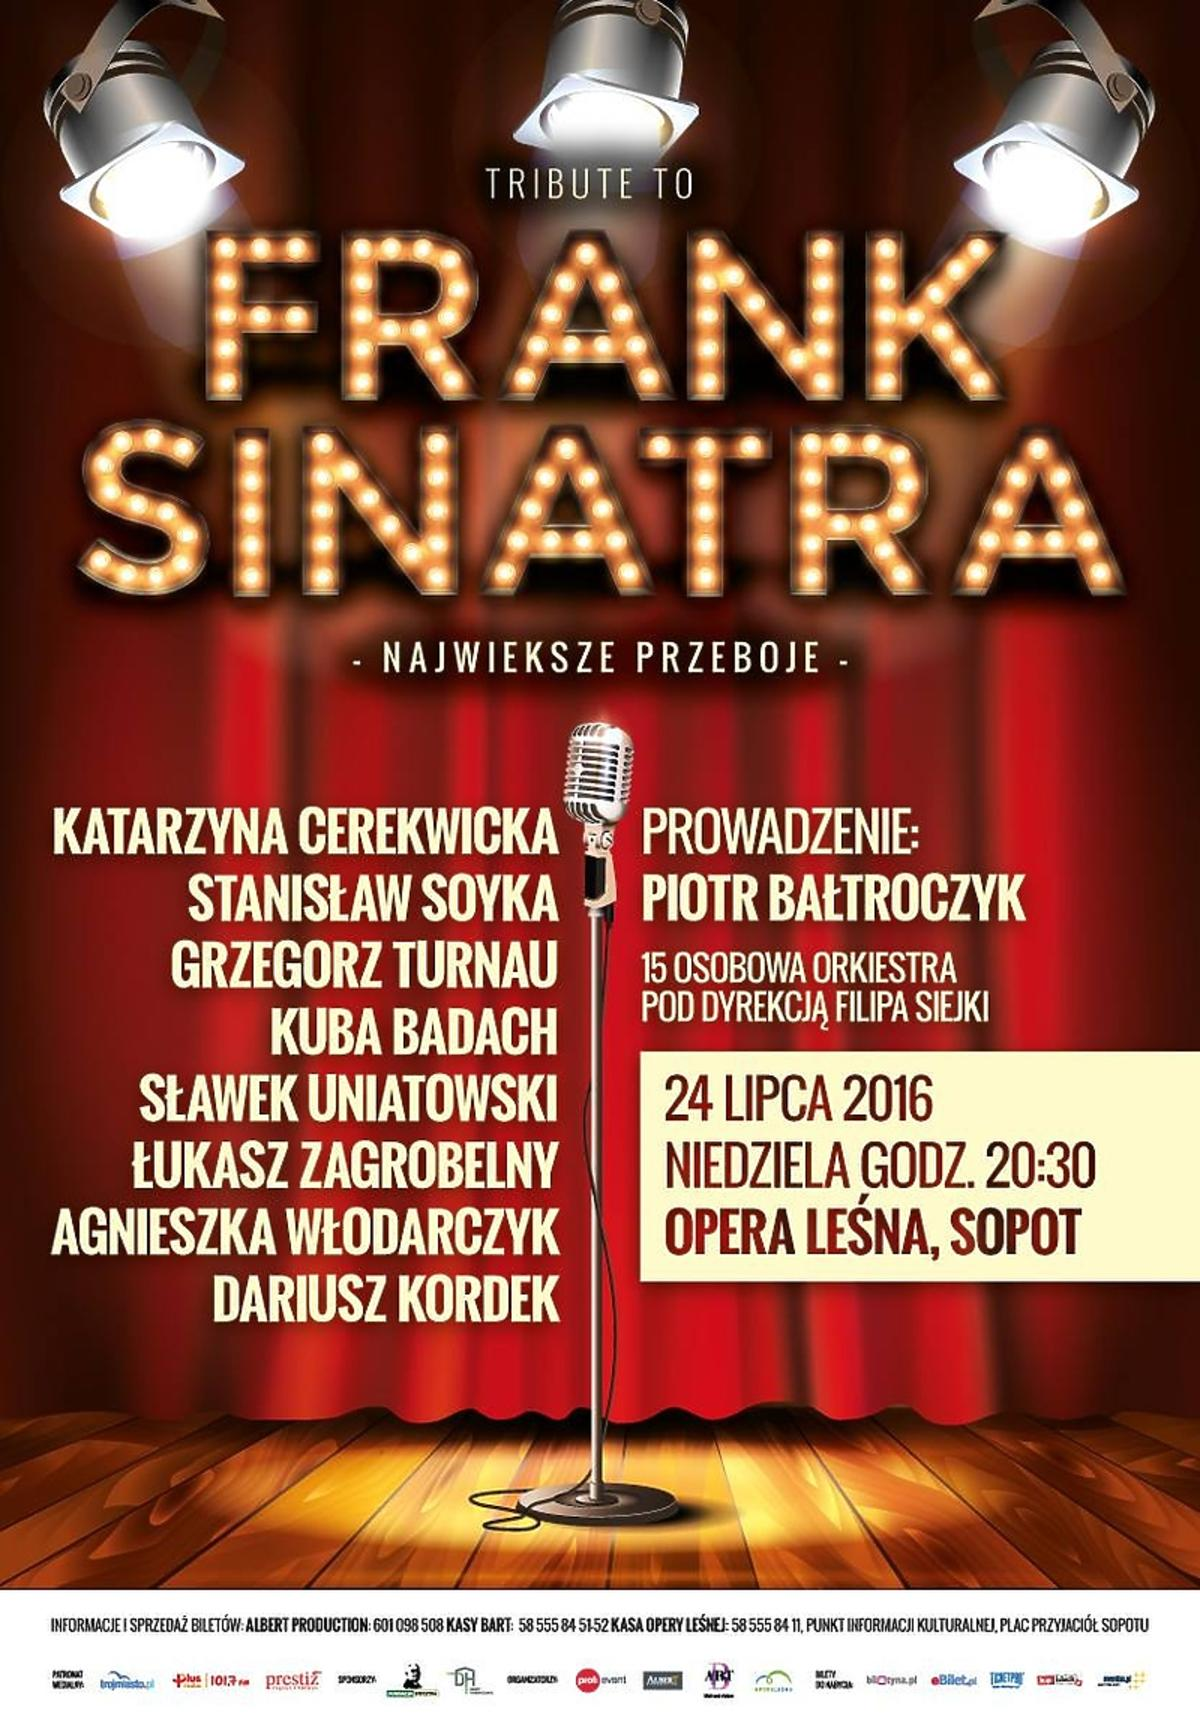 Plakat Tribute to Frank sinatra